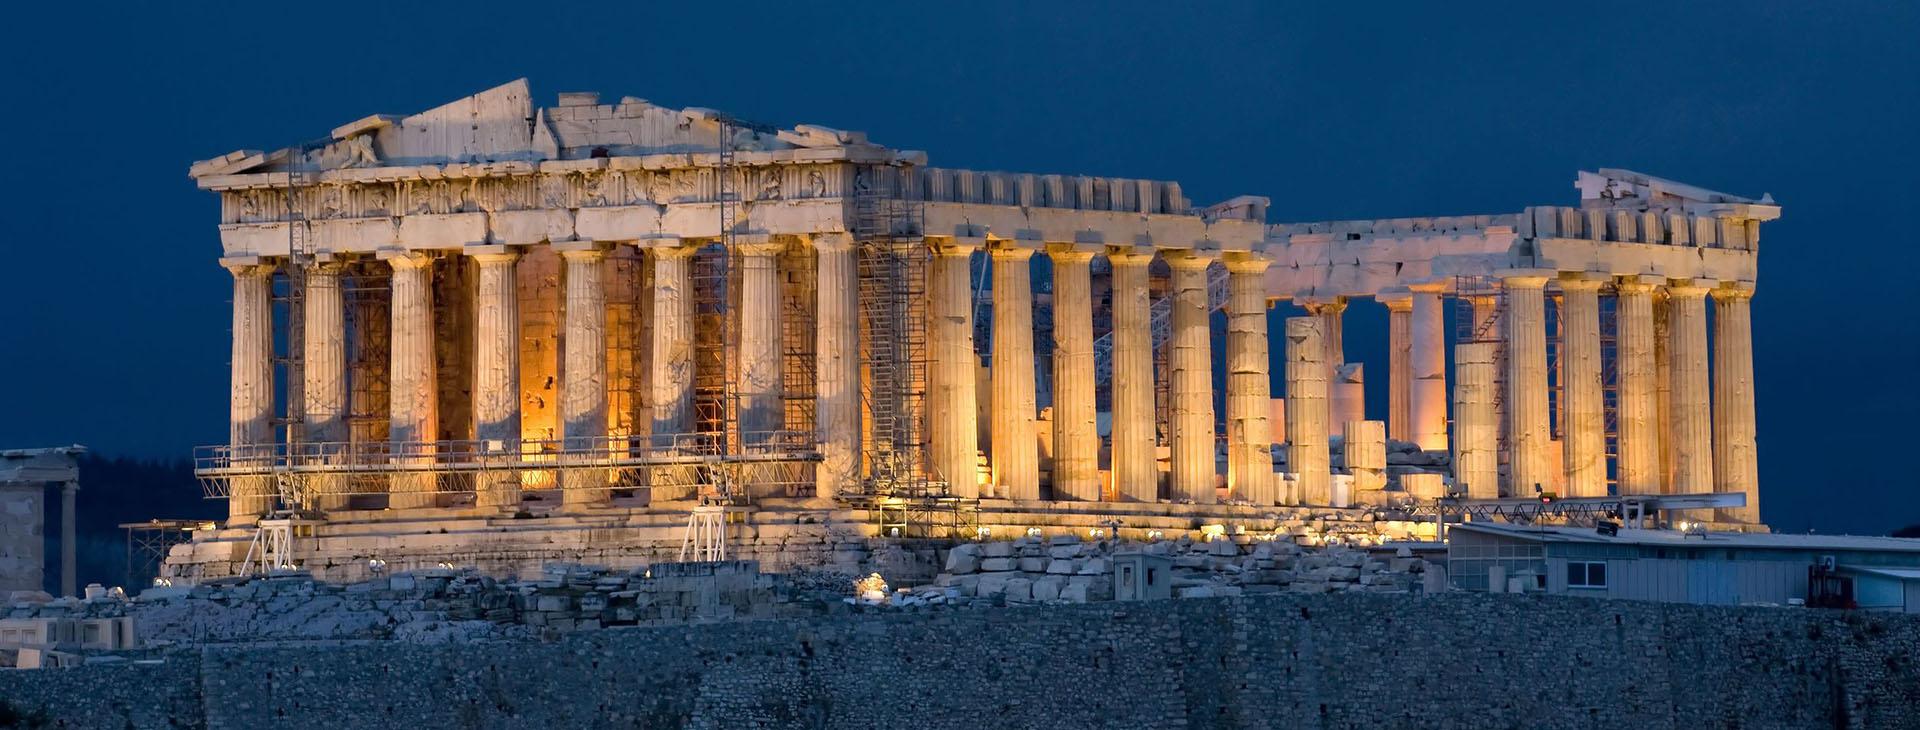 The Parthenon at Athens' Acropolis by night